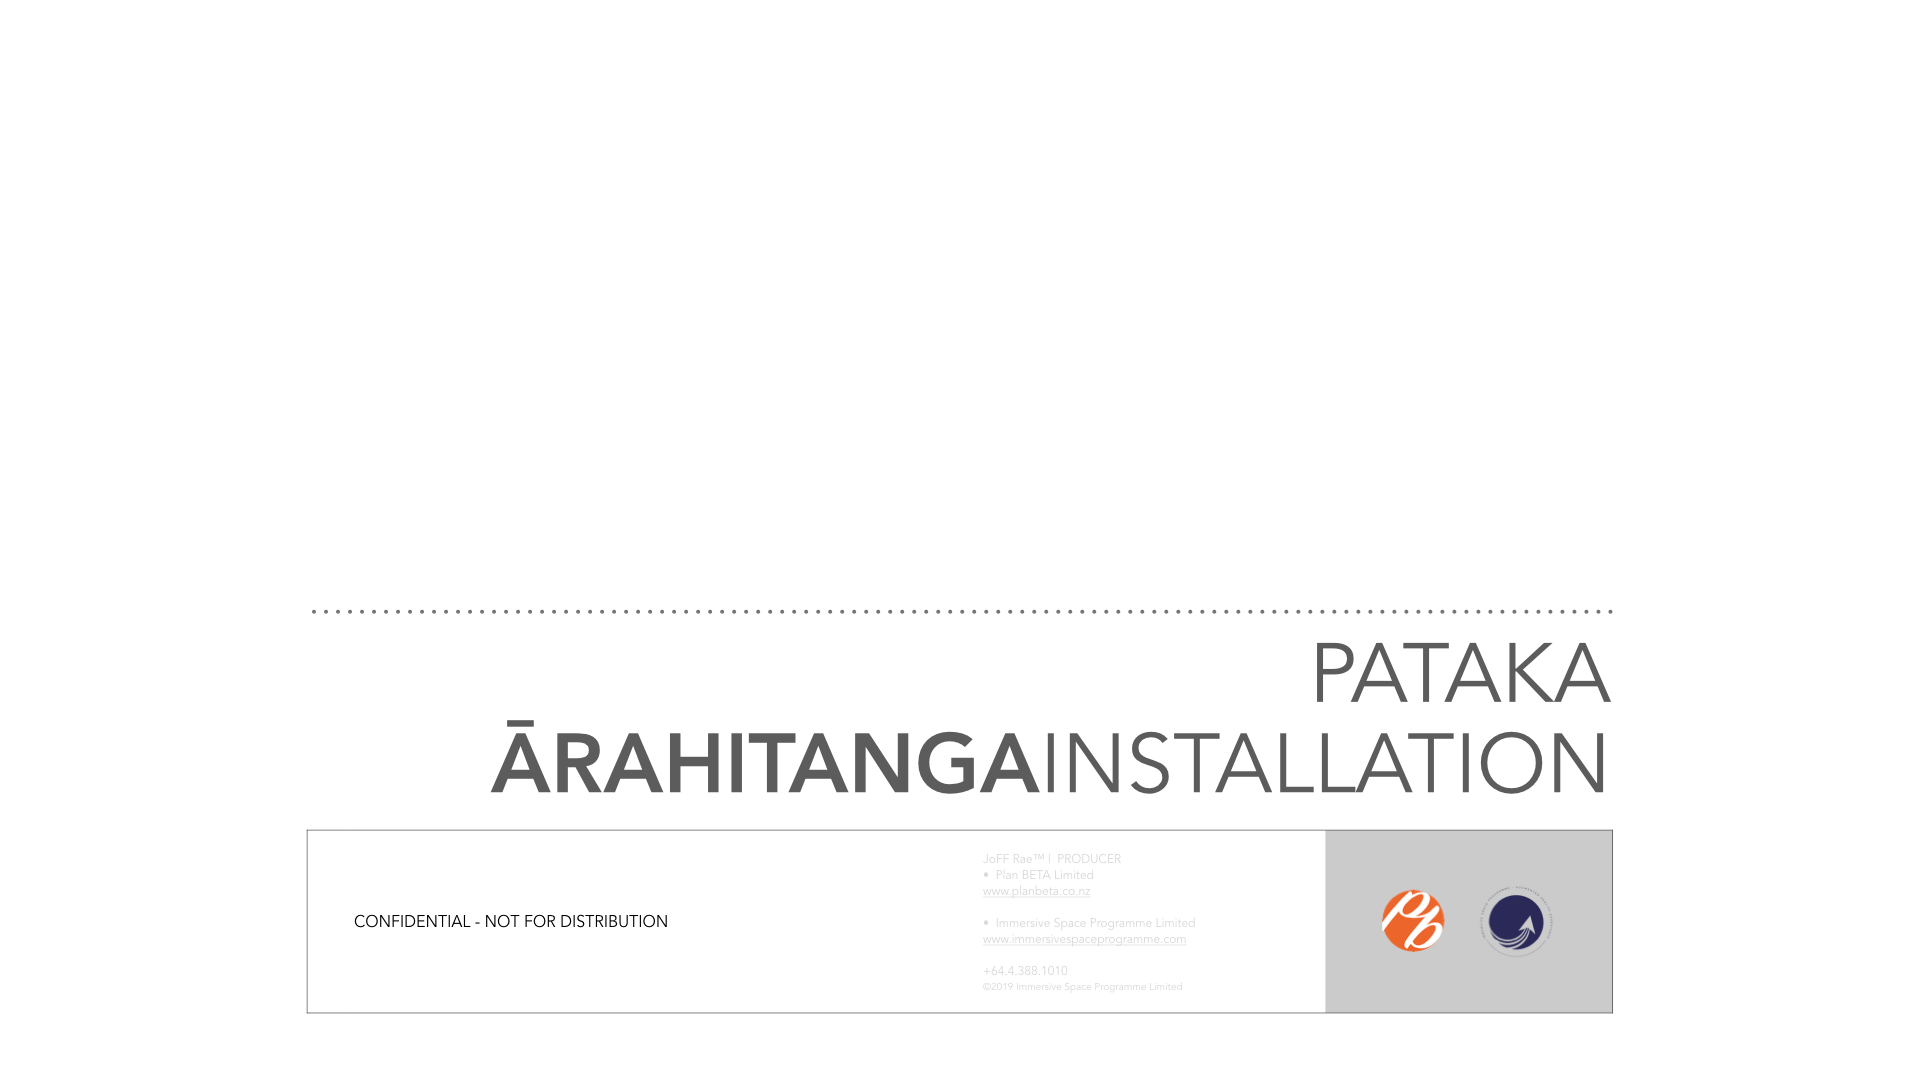 PATAKA_IPS_catalogueV1.1.001.jpeg